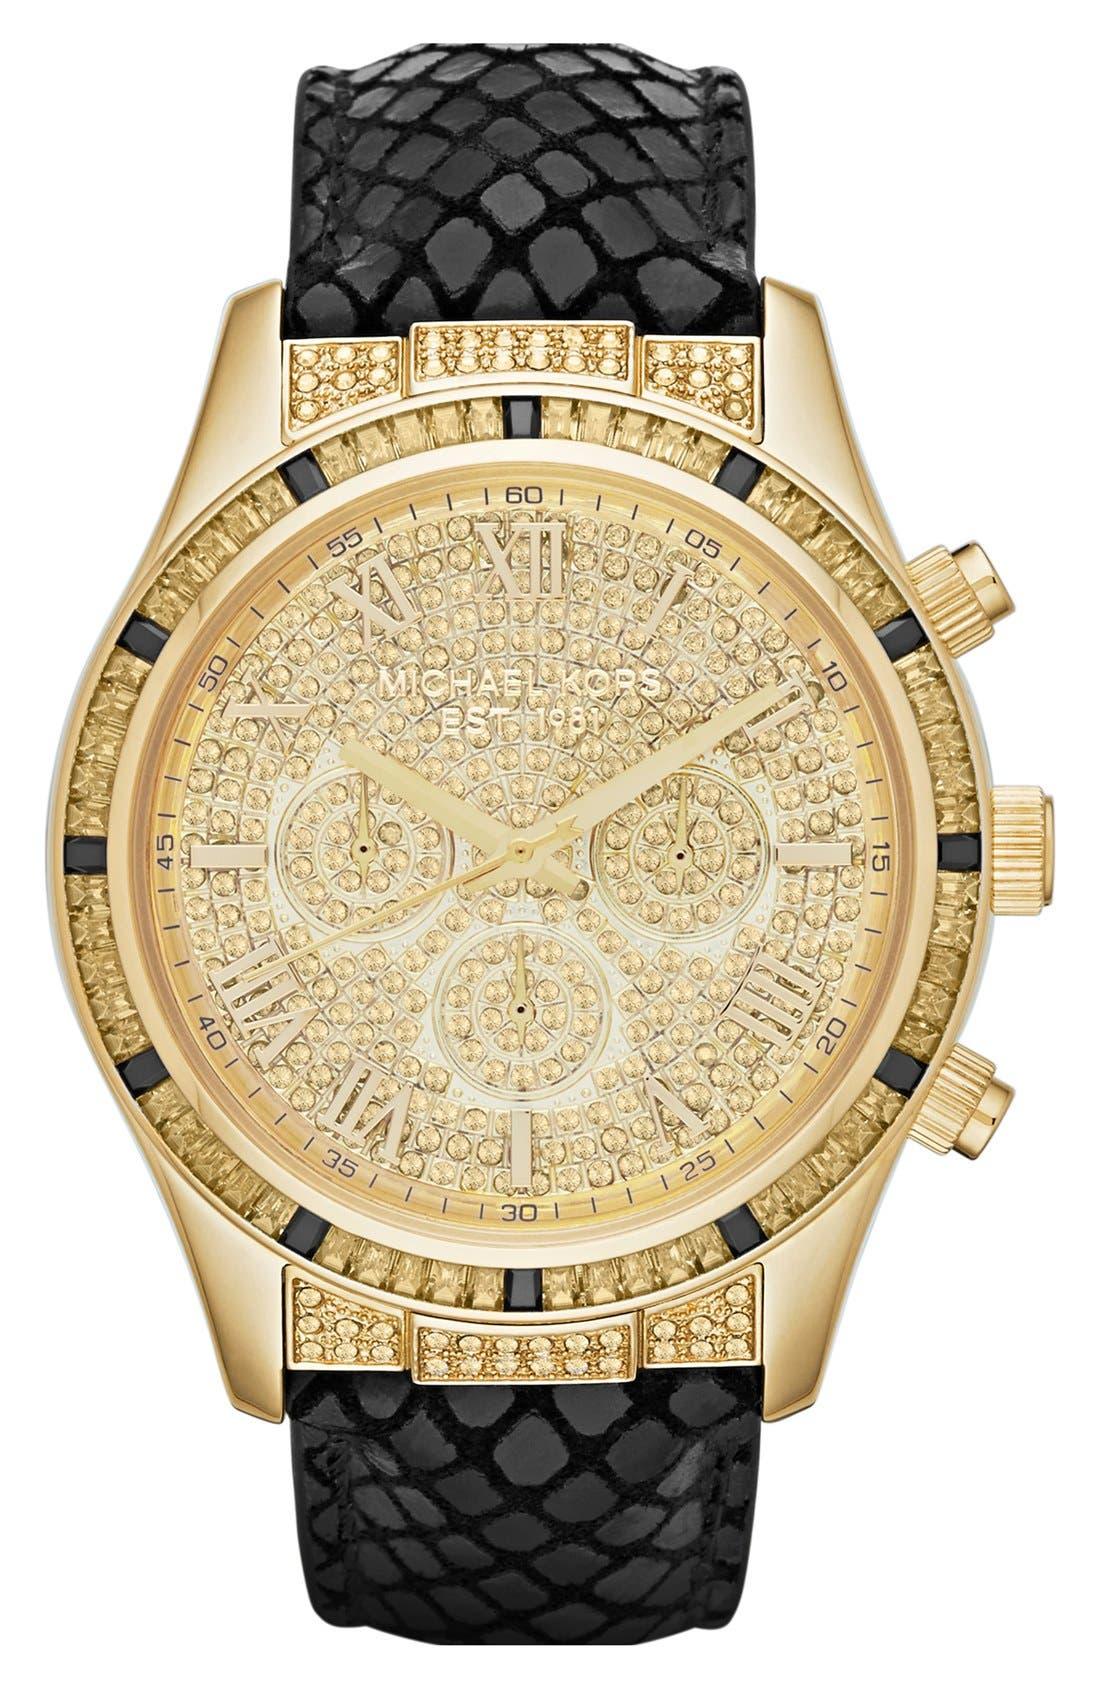 Main Image - Michael Kors 'Layton' Pavé Dial Chronograph Watch, 44mm